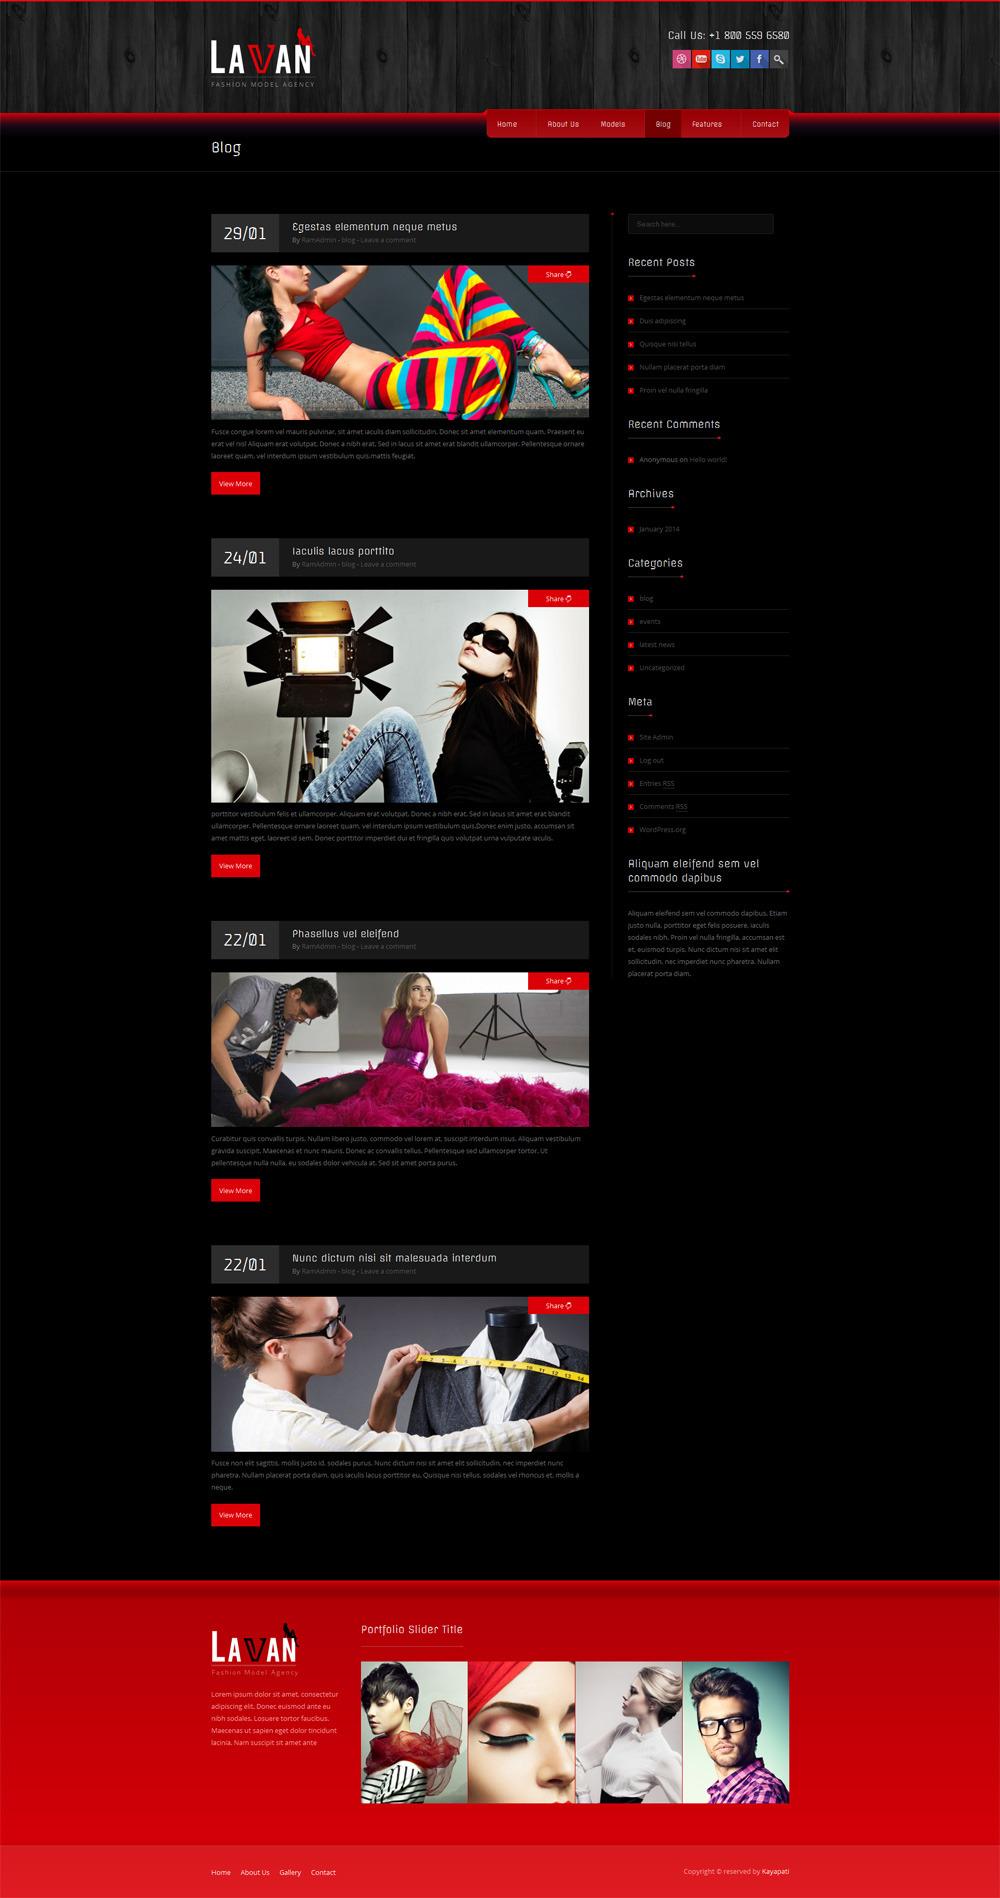 lavan fashion model agency wordpress cms theme by kayapati themeforest. Black Bedroom Furniture Sets. Home Design Ideas